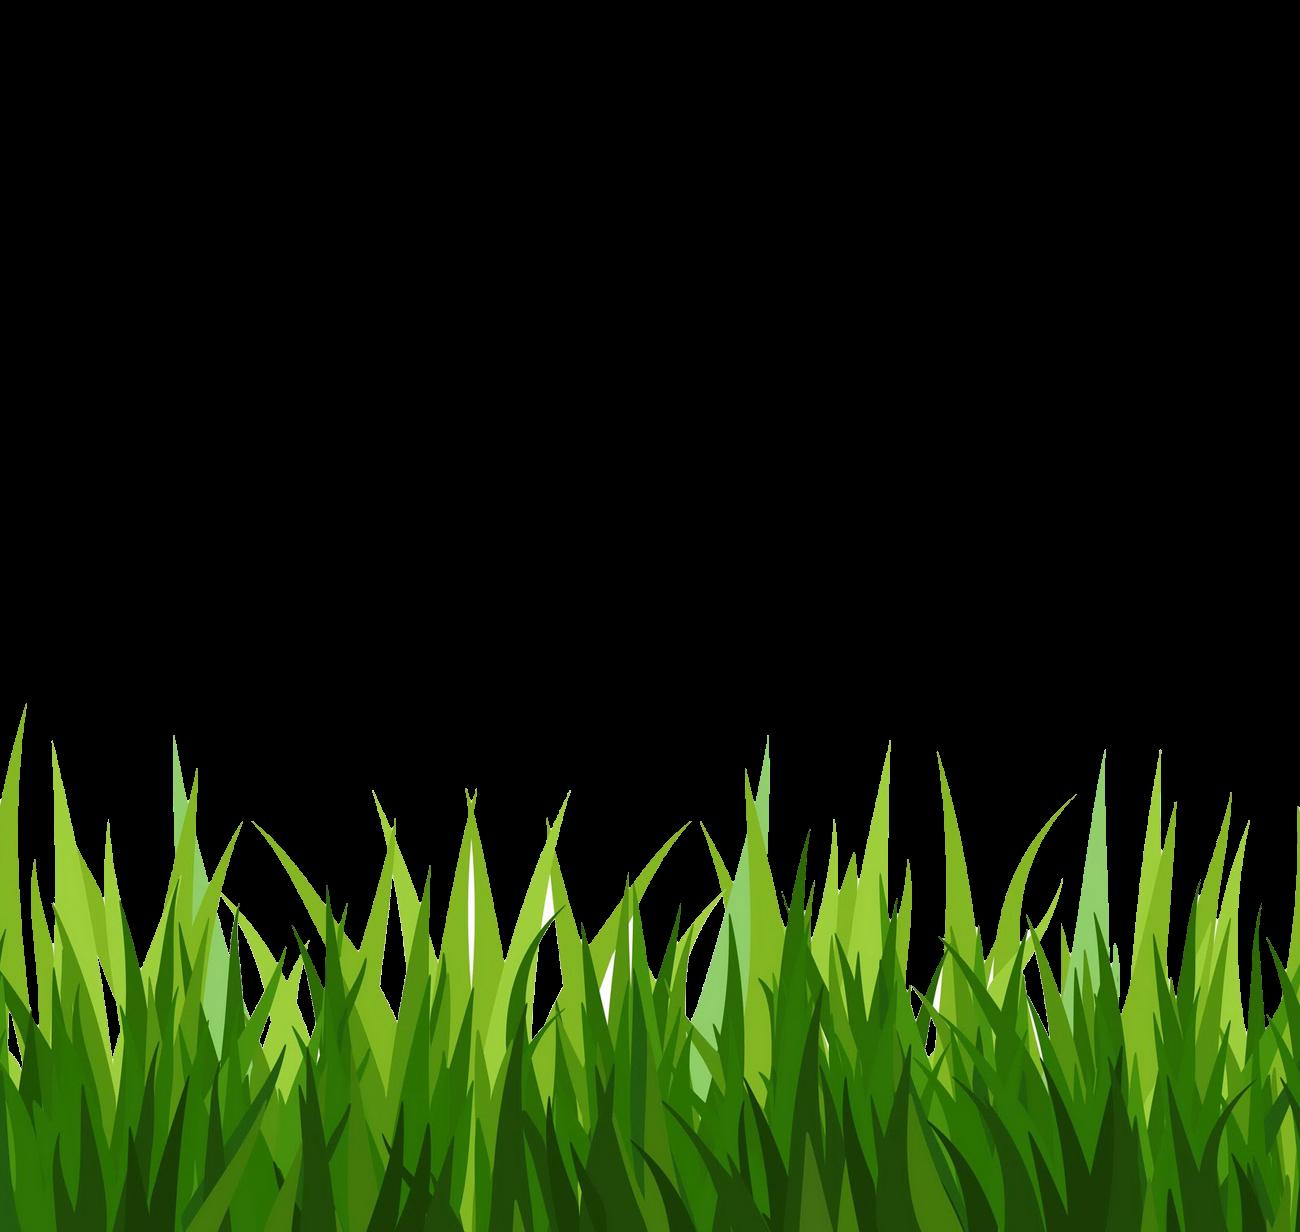 Hijiko Grass